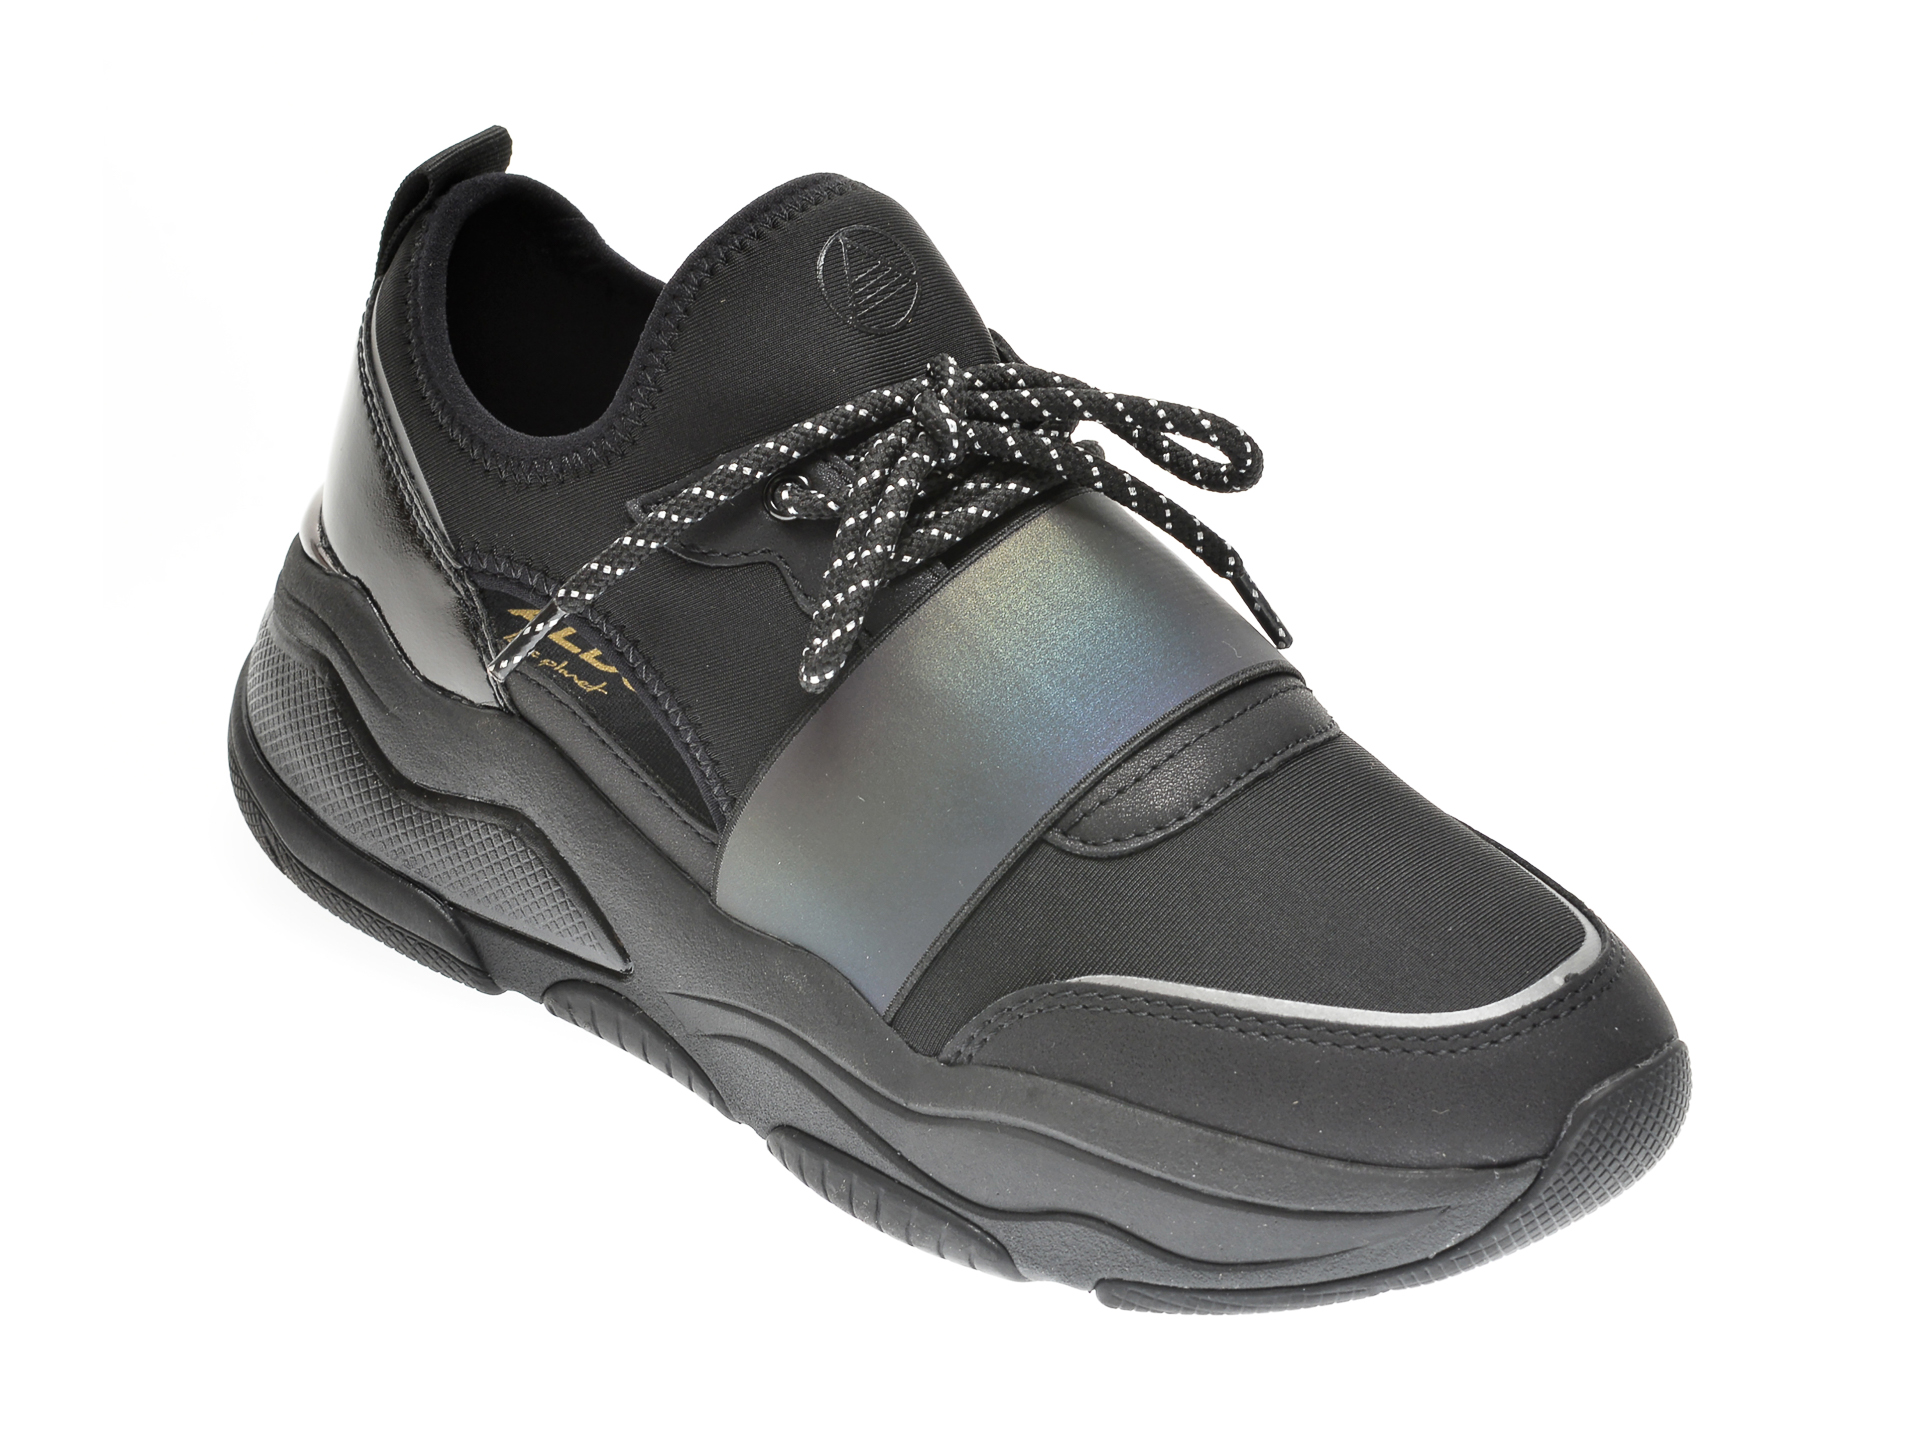 Pantofi sport ALDO negri, Rev008, din material textil si piele ecologica